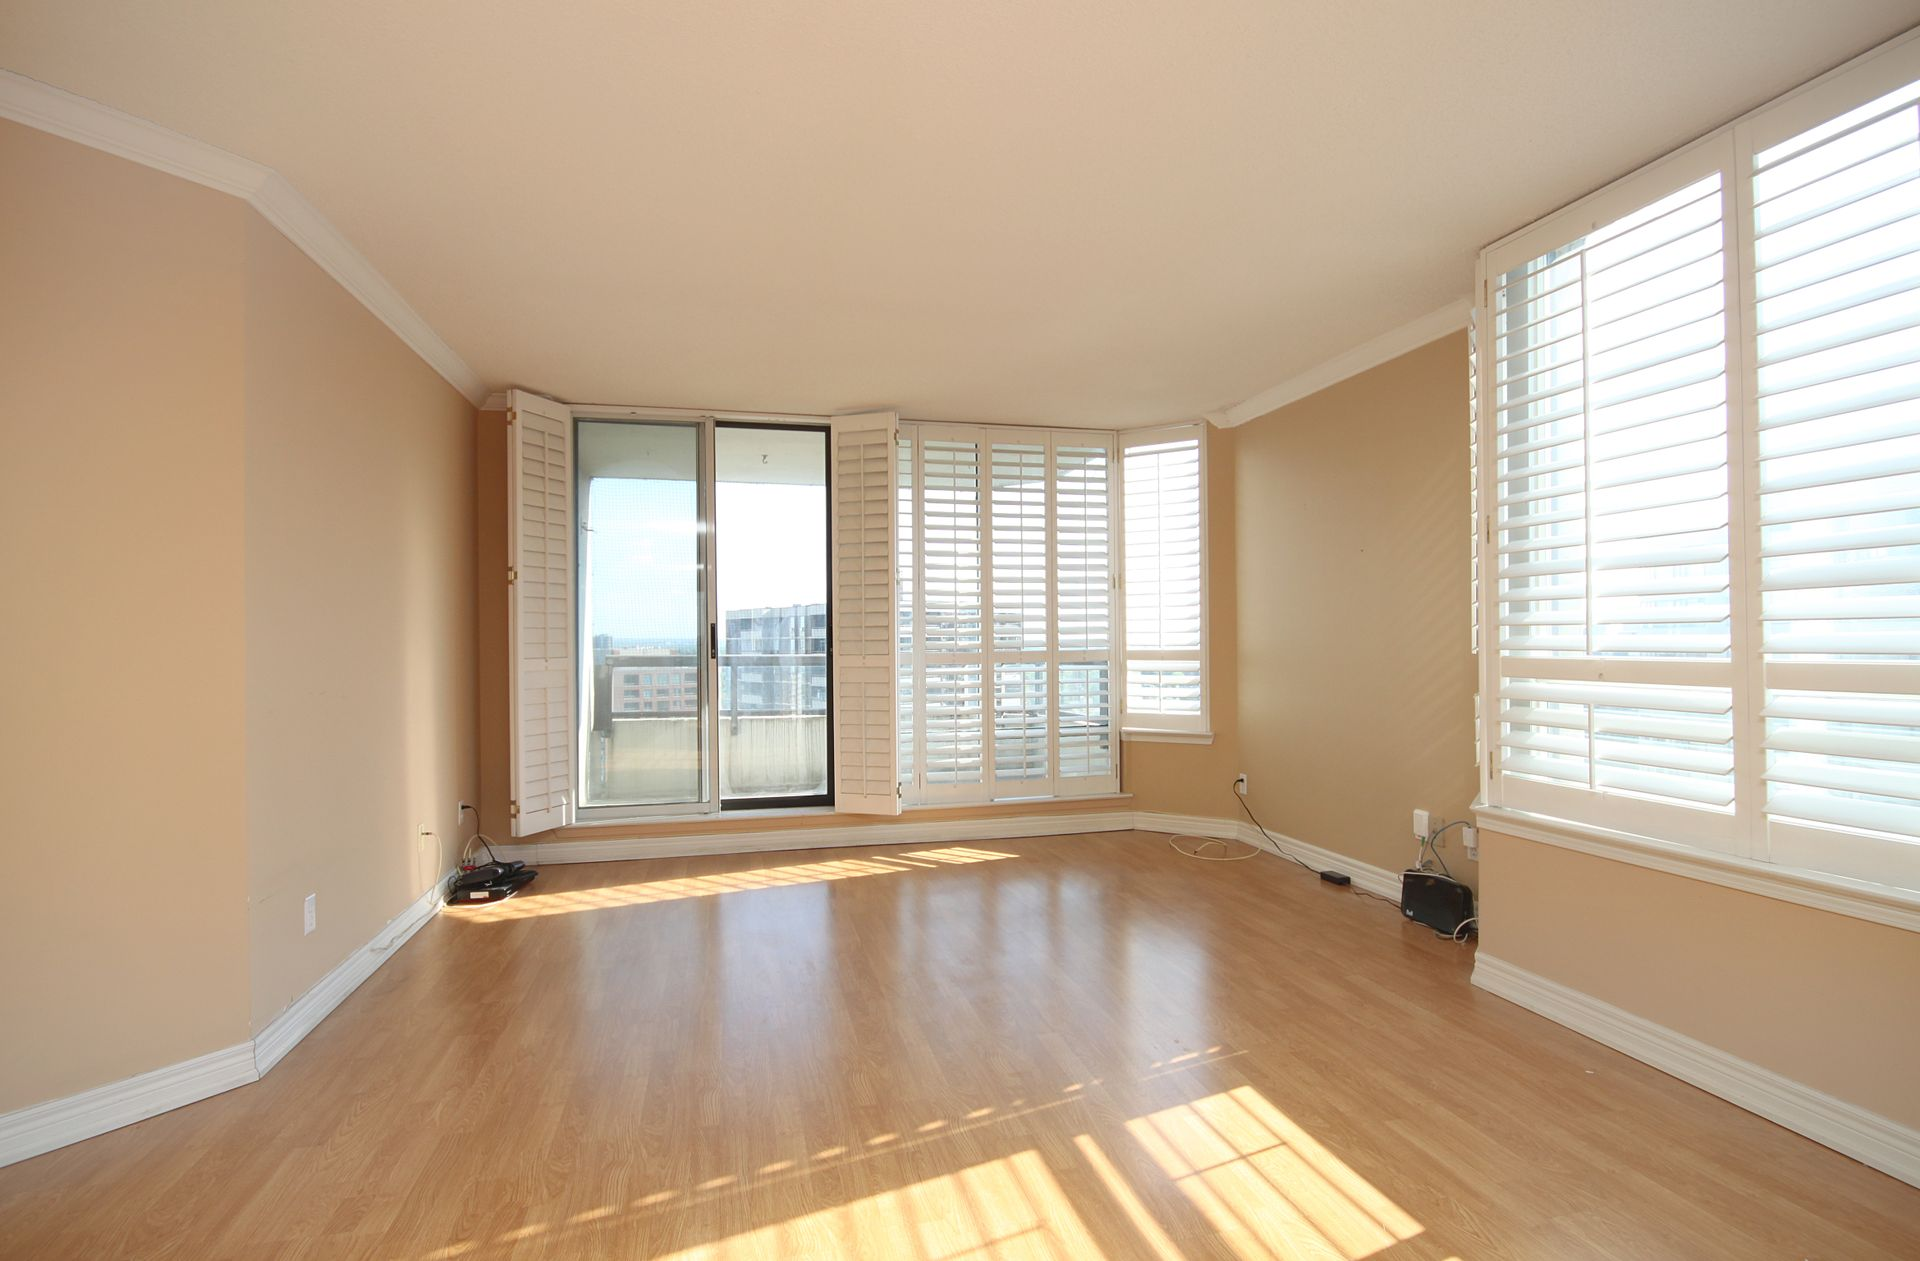 Living Room at PH211 - 1121 Steeles Avenue W, Westminster-Branson, Toronto